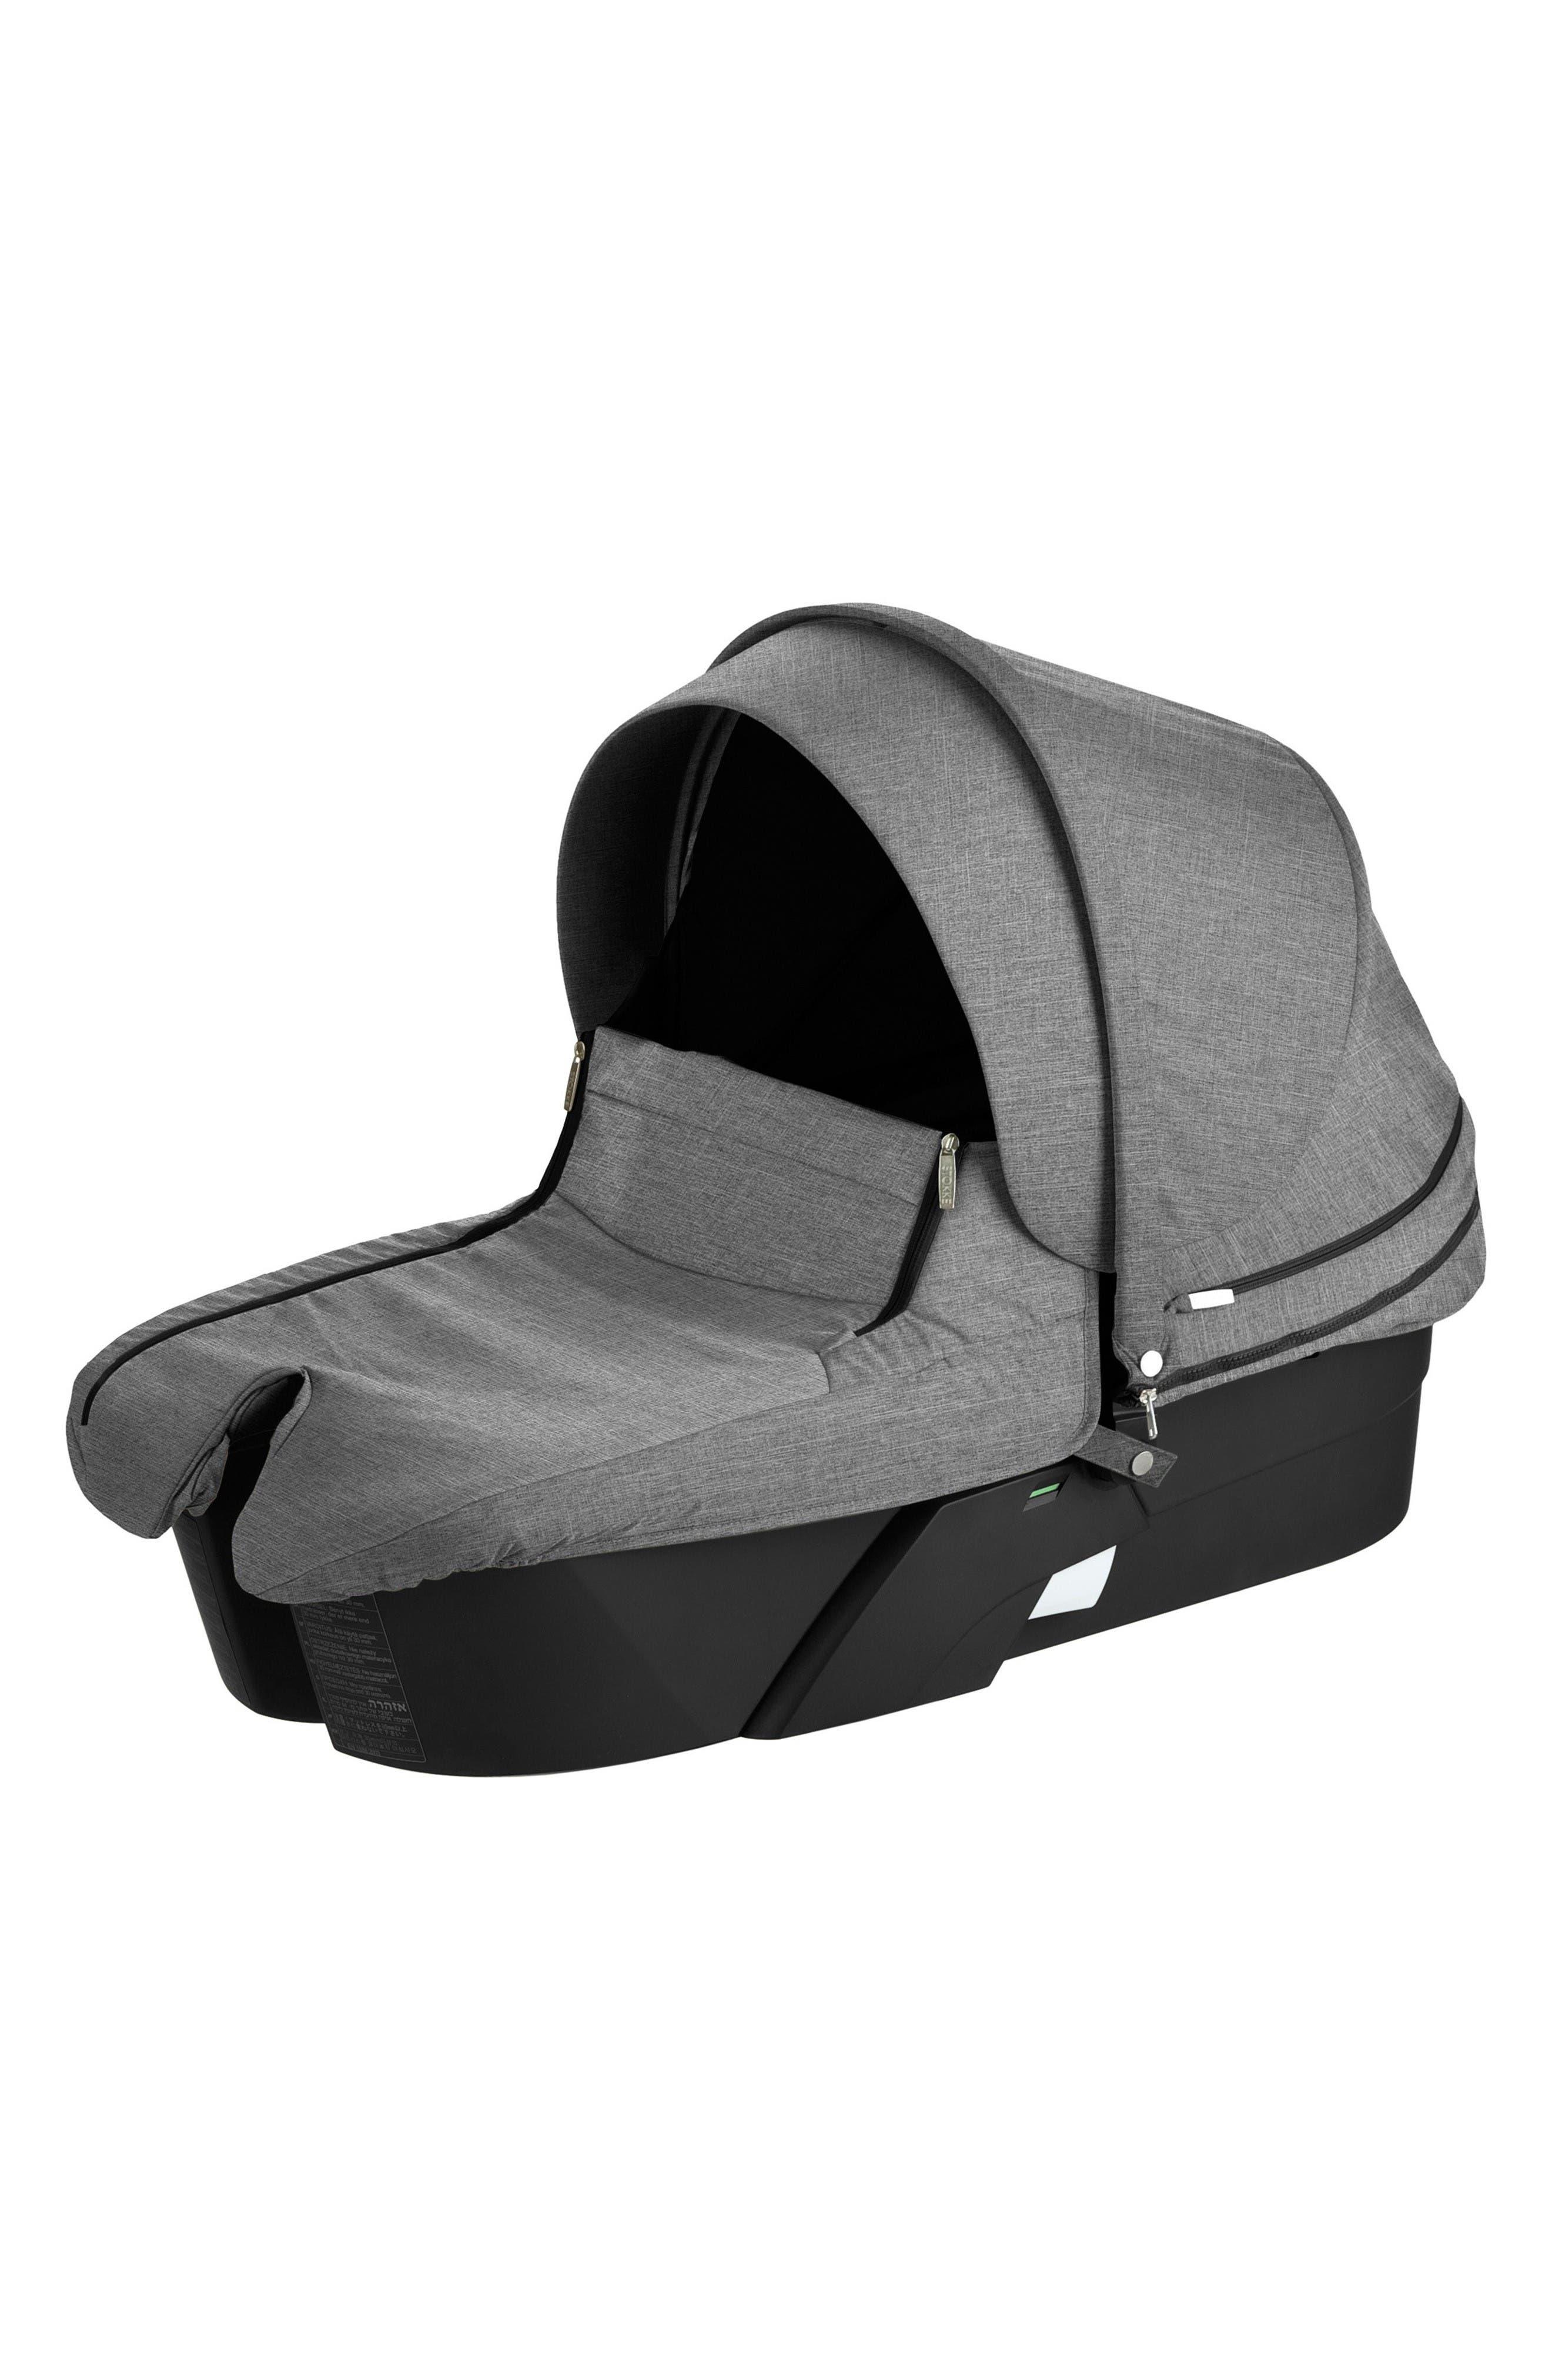 Stokke Xplory® Stroller Carry Cot